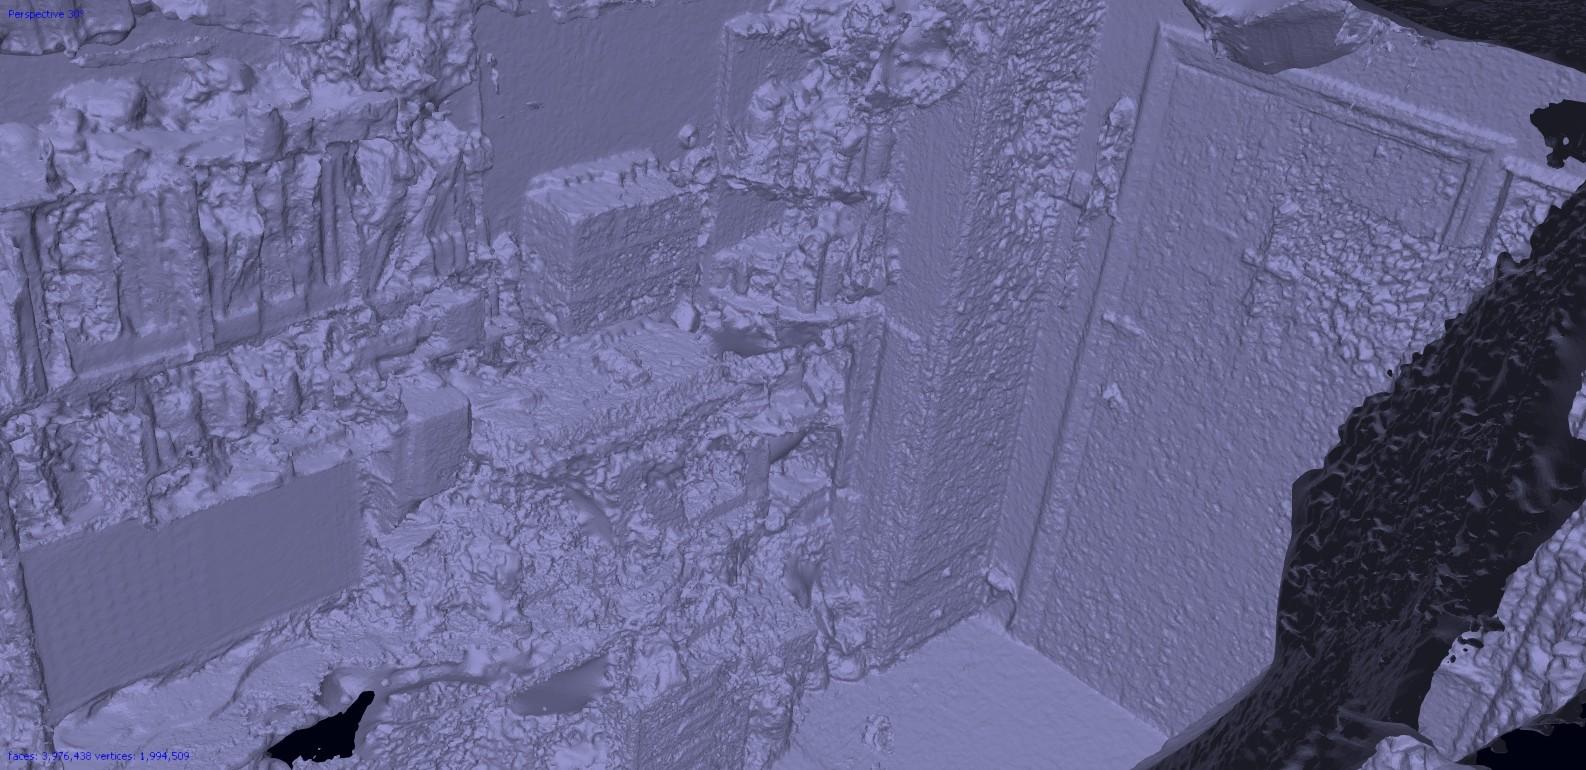 Daedalus system screenshot 14